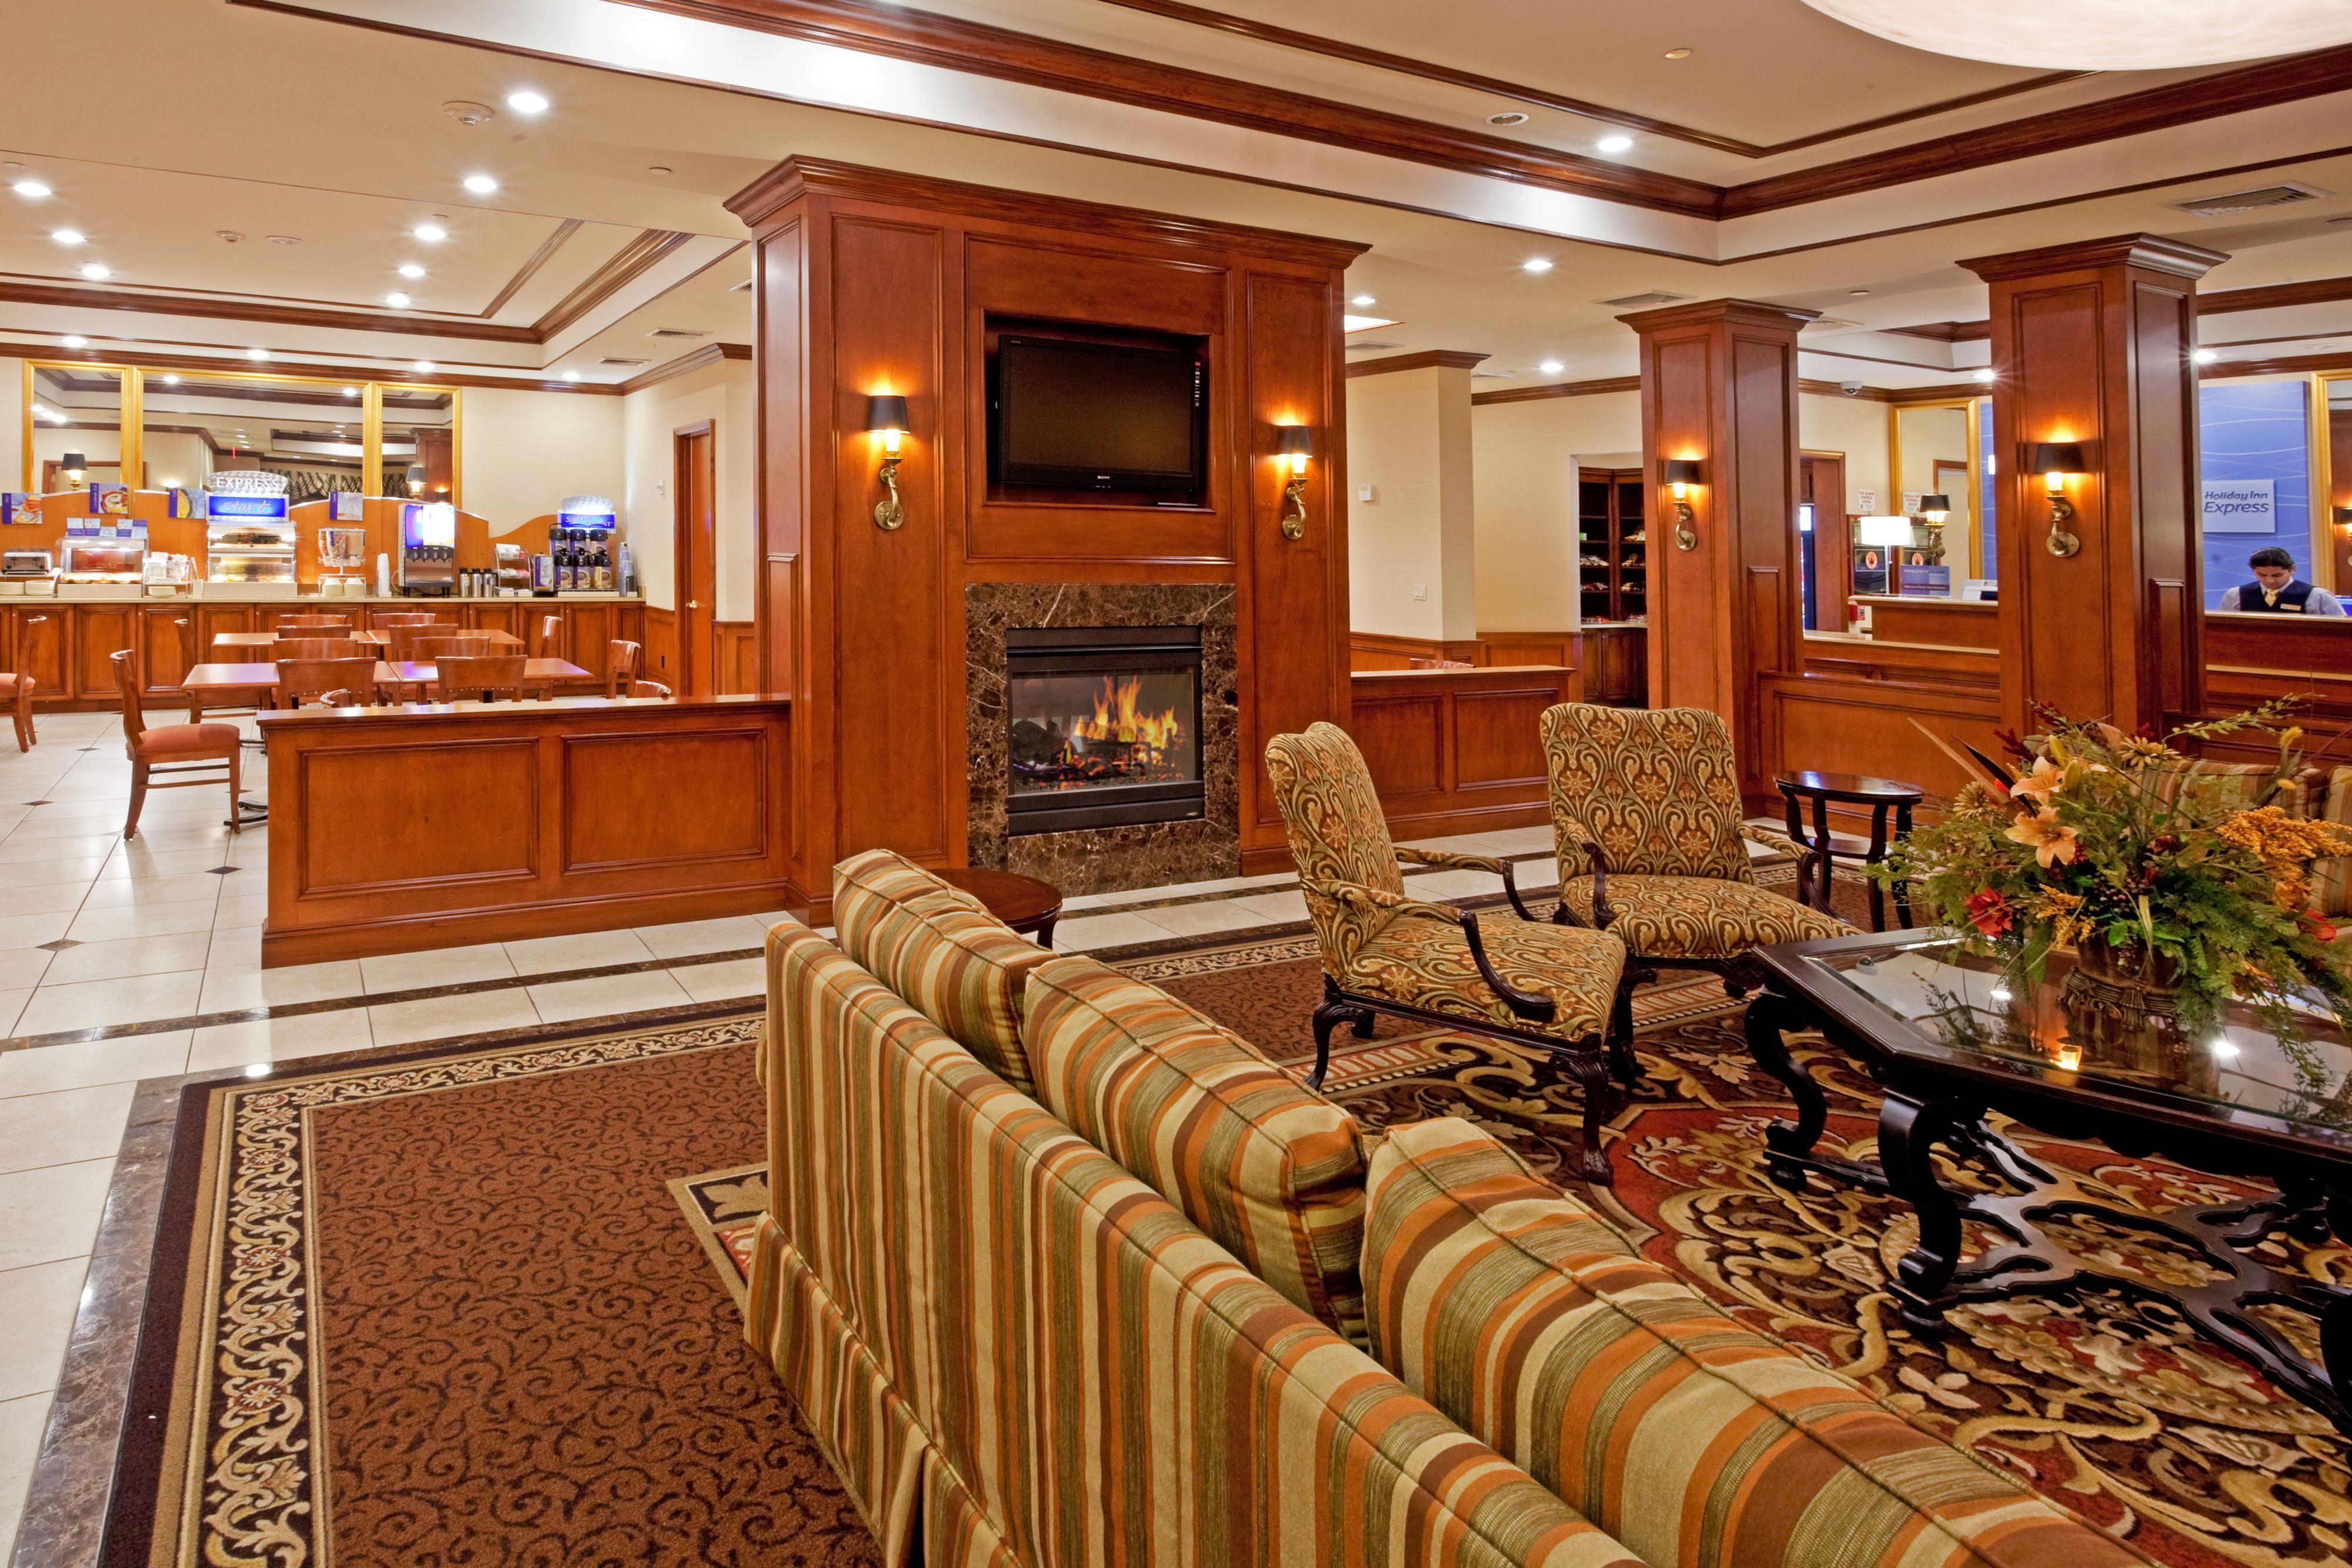 Holiday Inn Express Lynbrook - Rockville Centre image 7